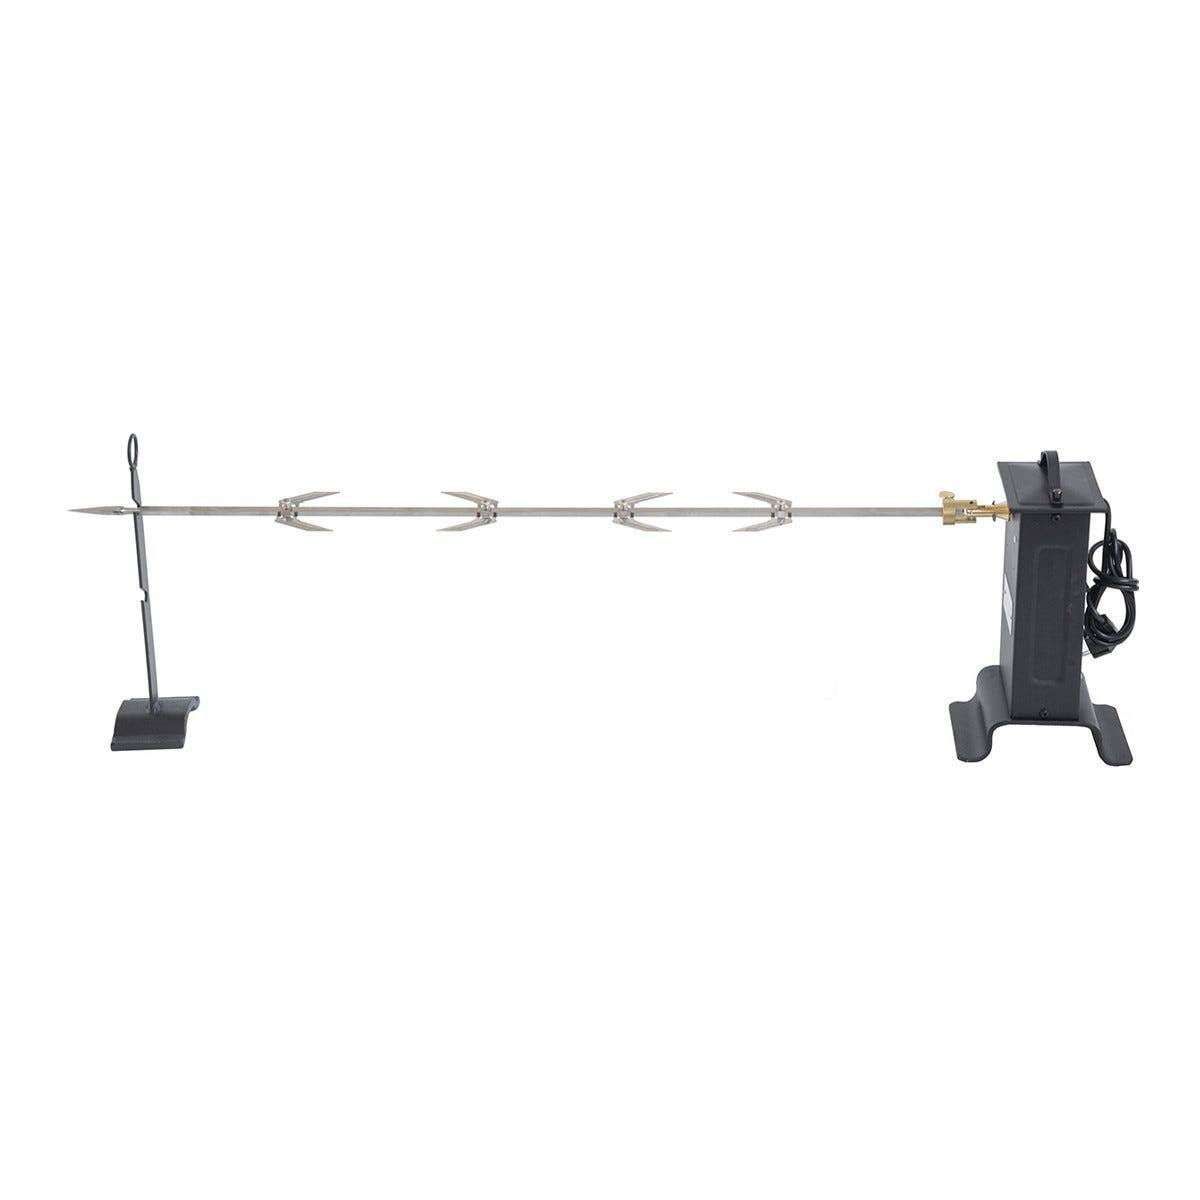 girarrosto elettrico 1 spiedo 100 cm giunto cardanico portata 10 kg